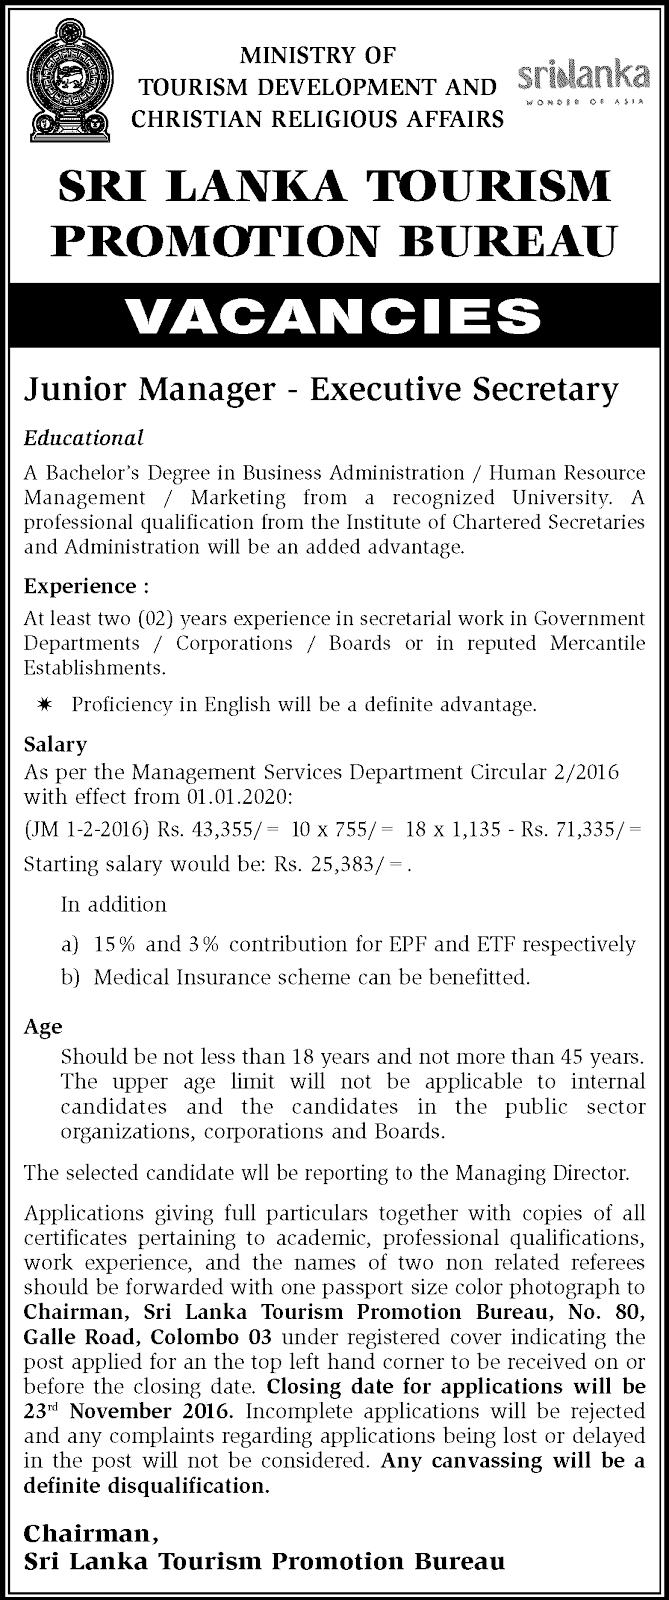 Sri Lankan Government Job Vacancies At Sri Lanka Tourism Promotion Bureau ස ච රක ප රවර ධන හ ක ර ස ත ය න කටය ත අම Government Jobs Marketing Jobs Government